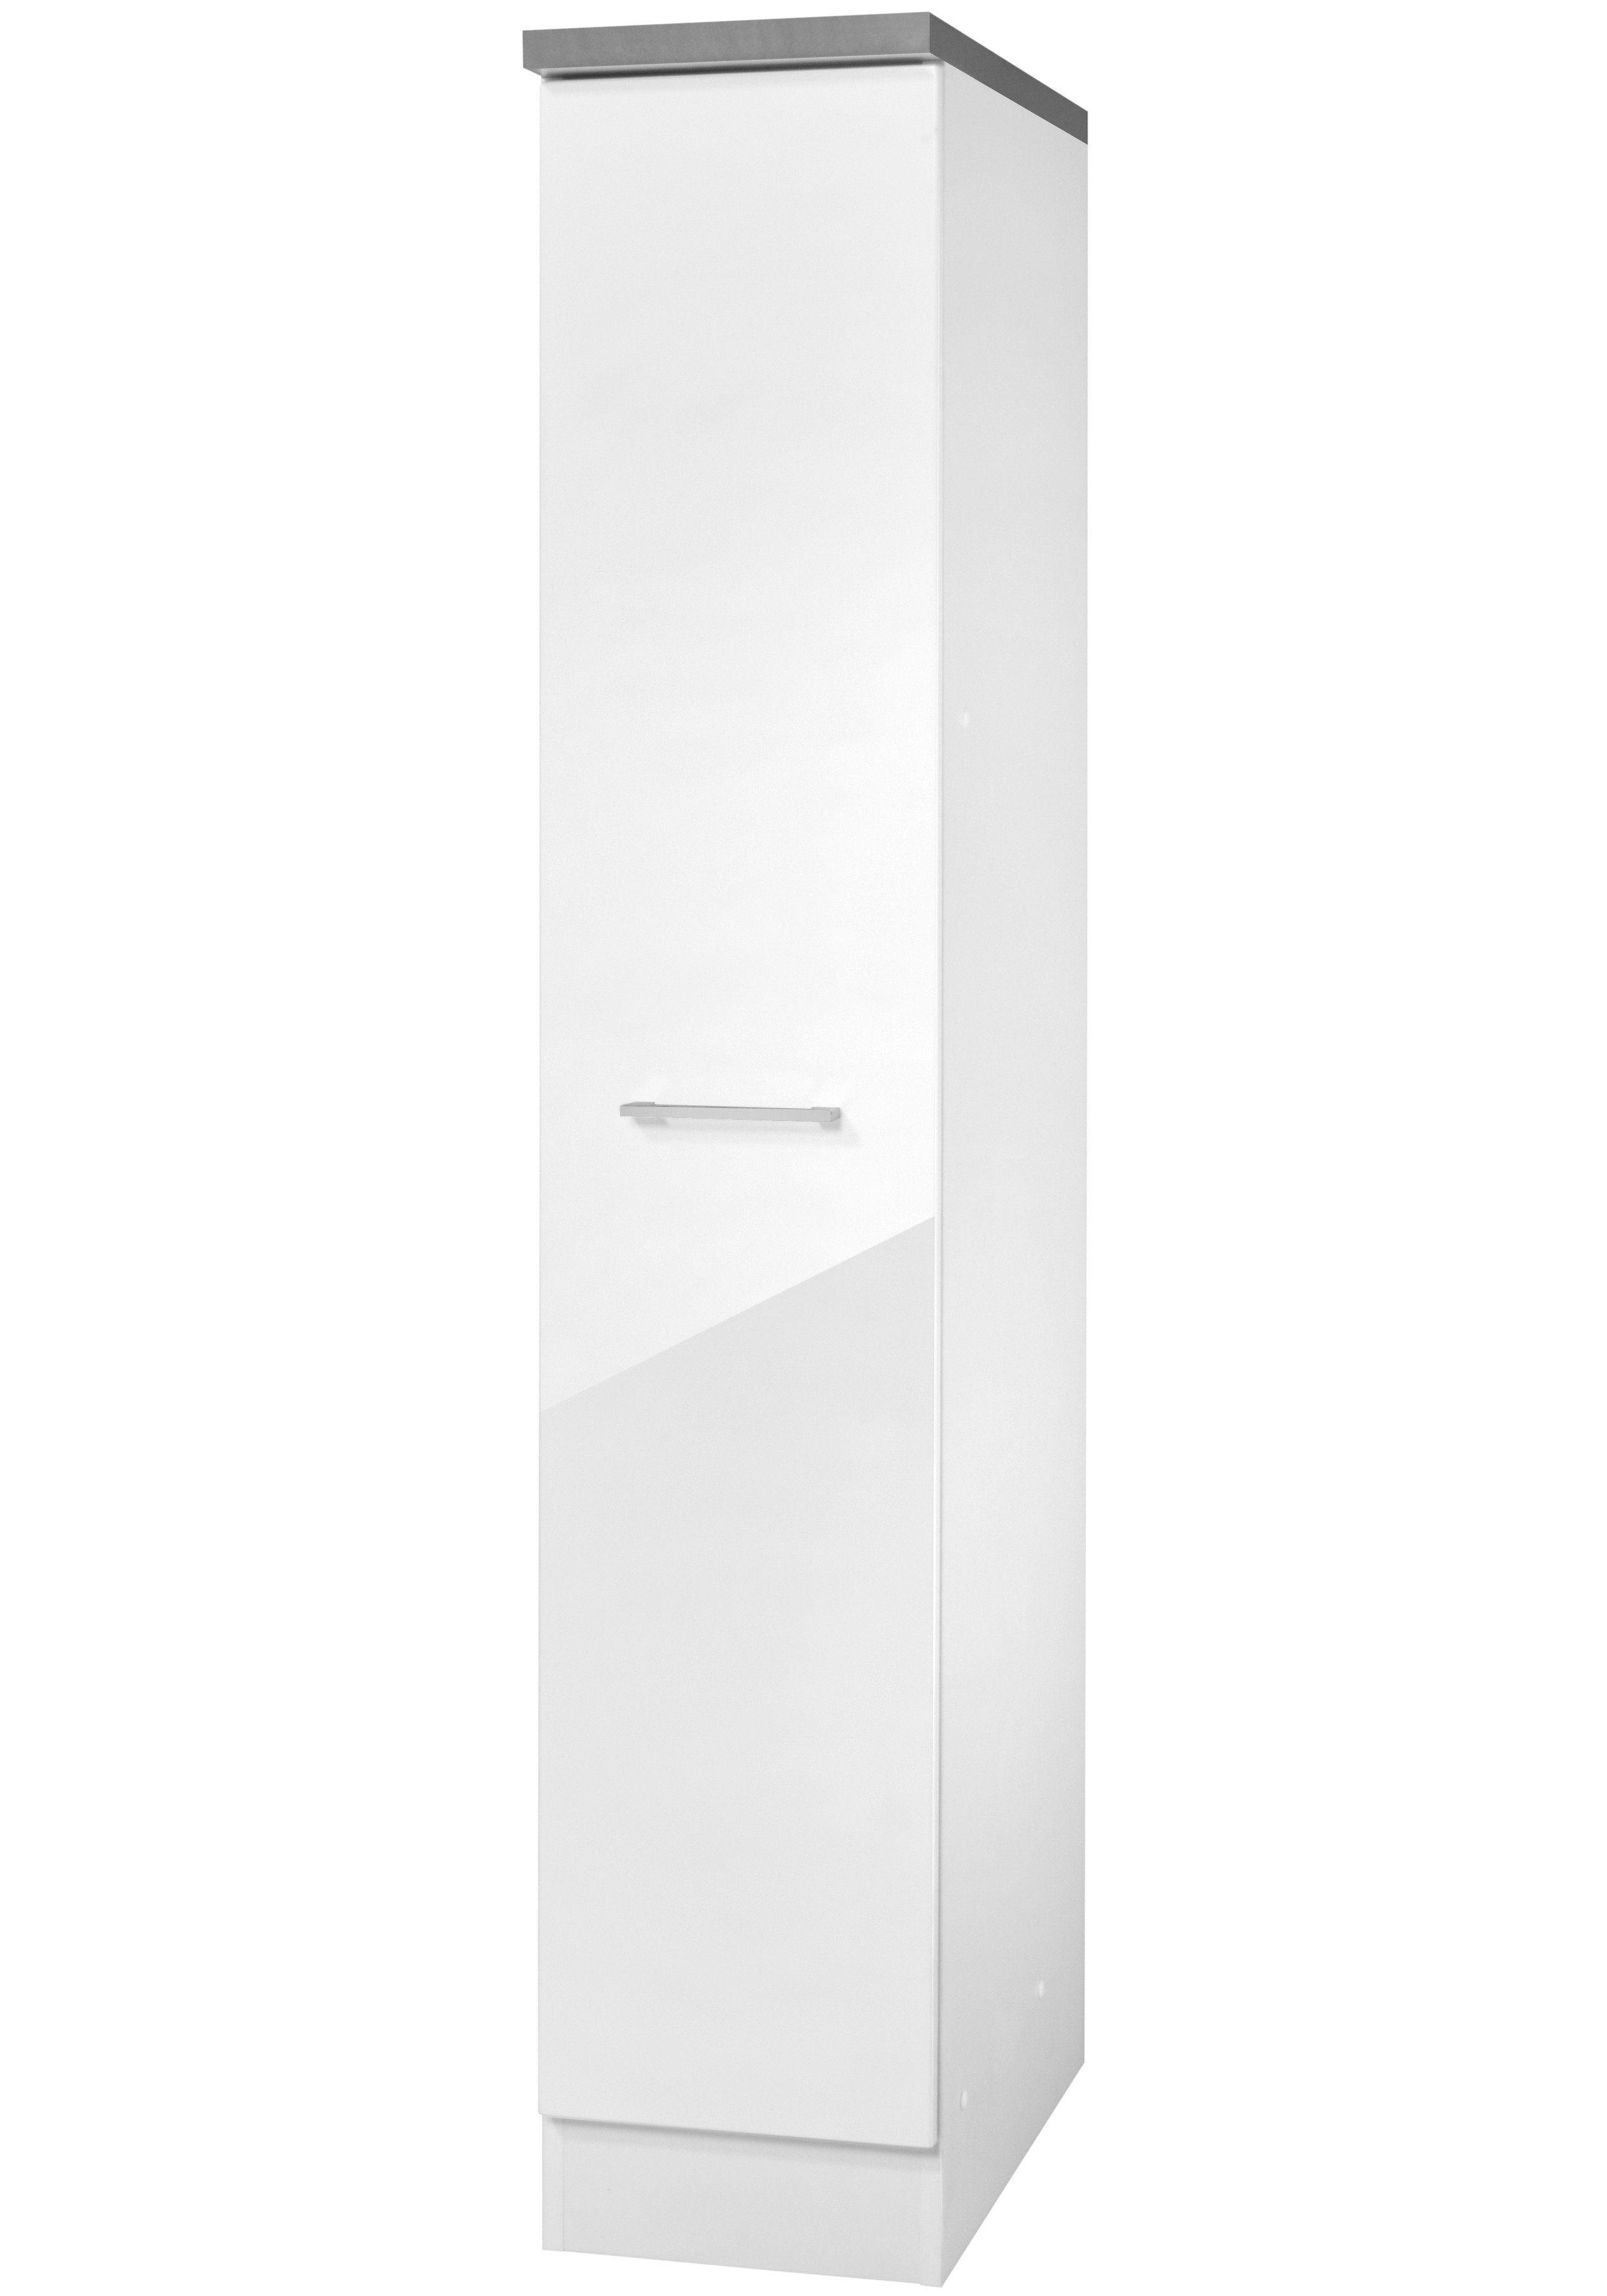 Held Möbel Apothekerschrank »Philadelphia«, Höhe 165 cm